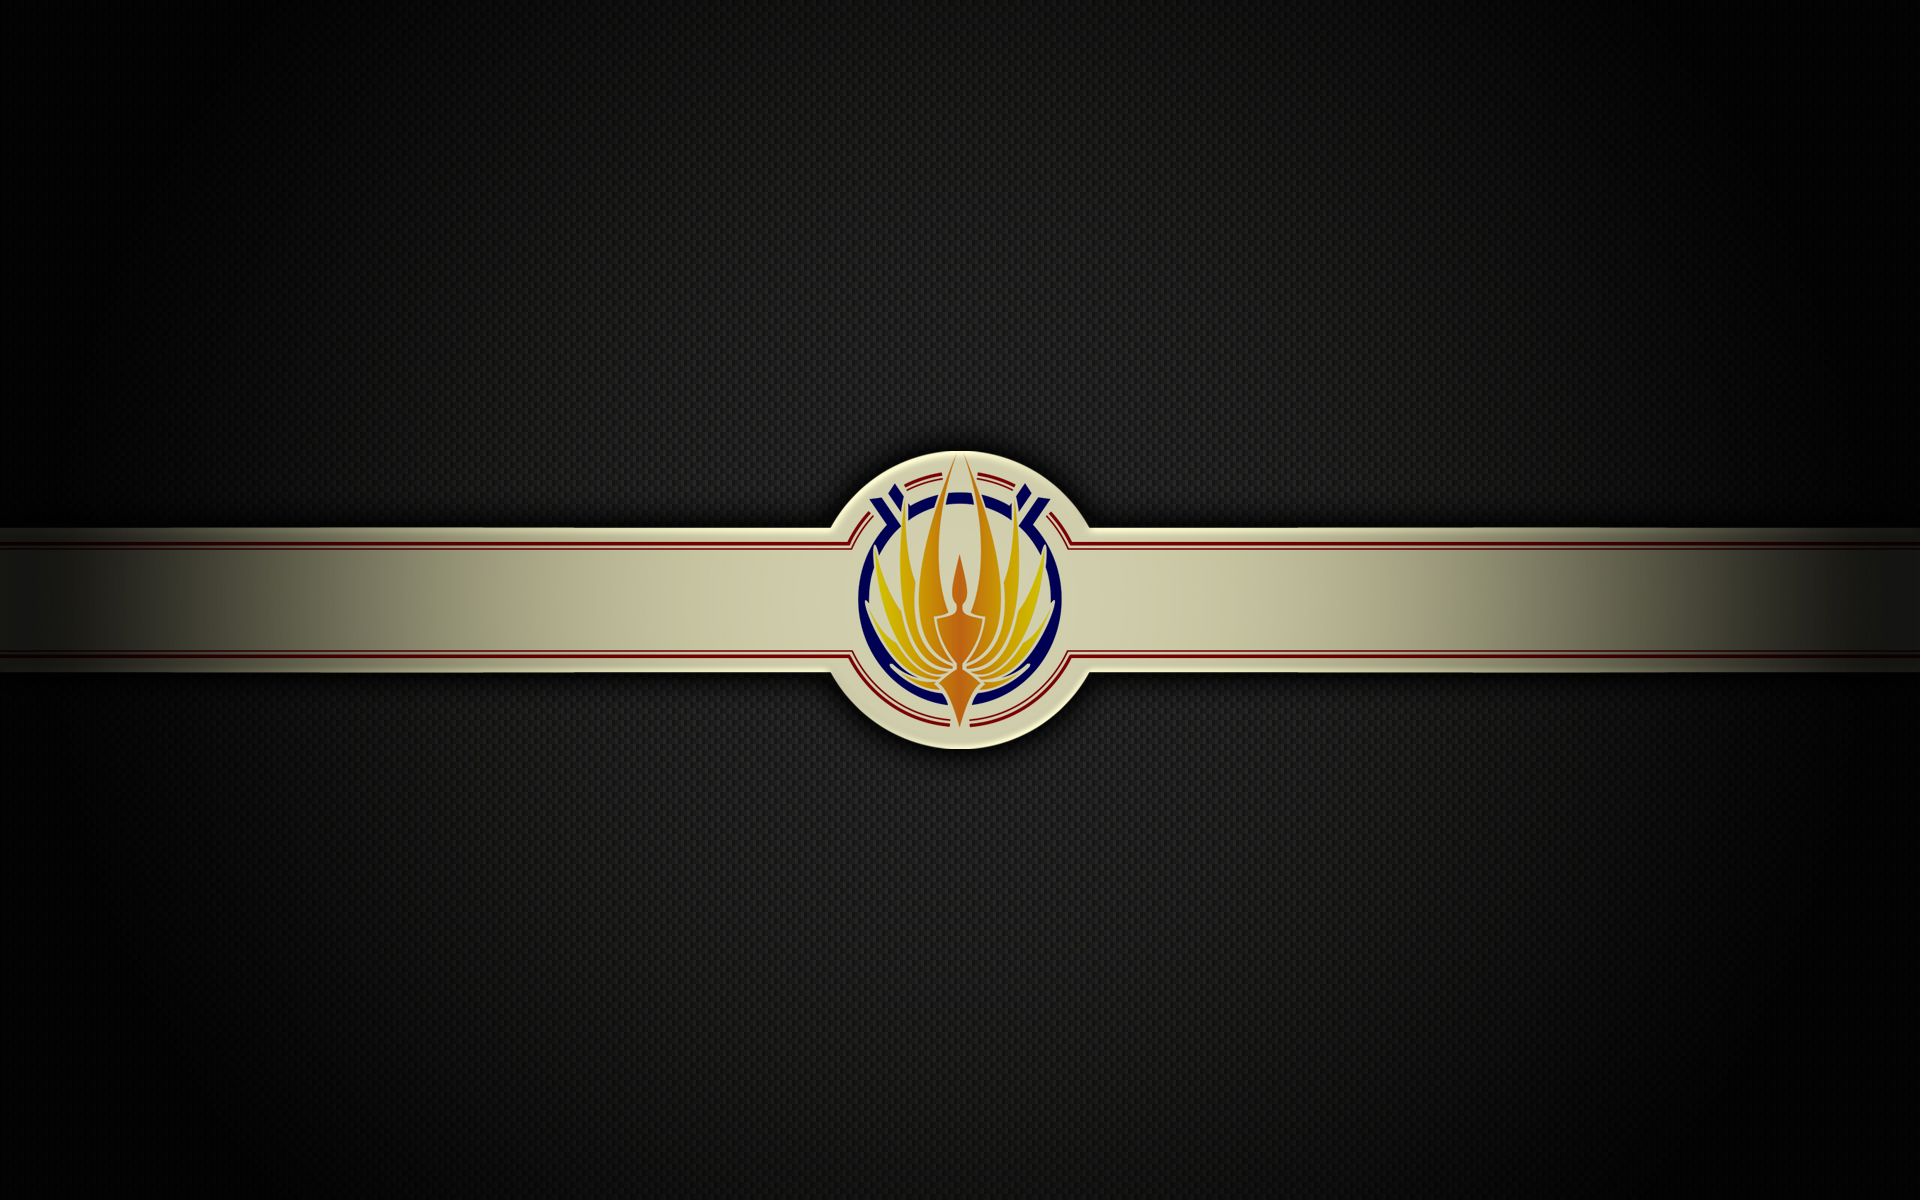 Wallpaper logo background cool art   424991 1920x1200